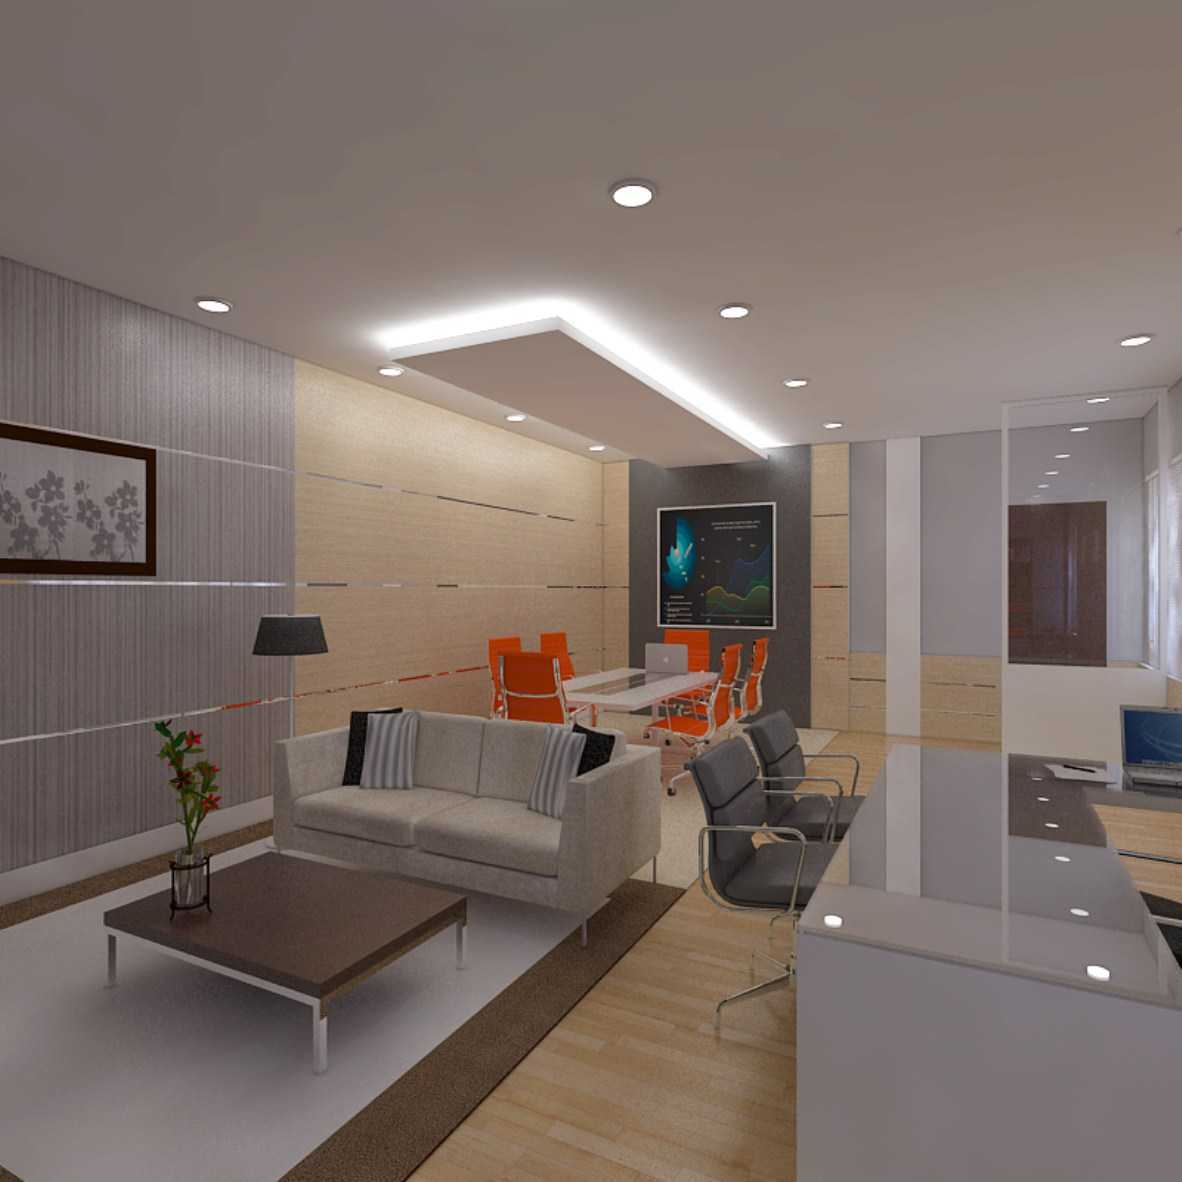 Arsindo Cipta Karya Bbp2Tp Office Project Jakarta Jakarta Office Room Modern  26837